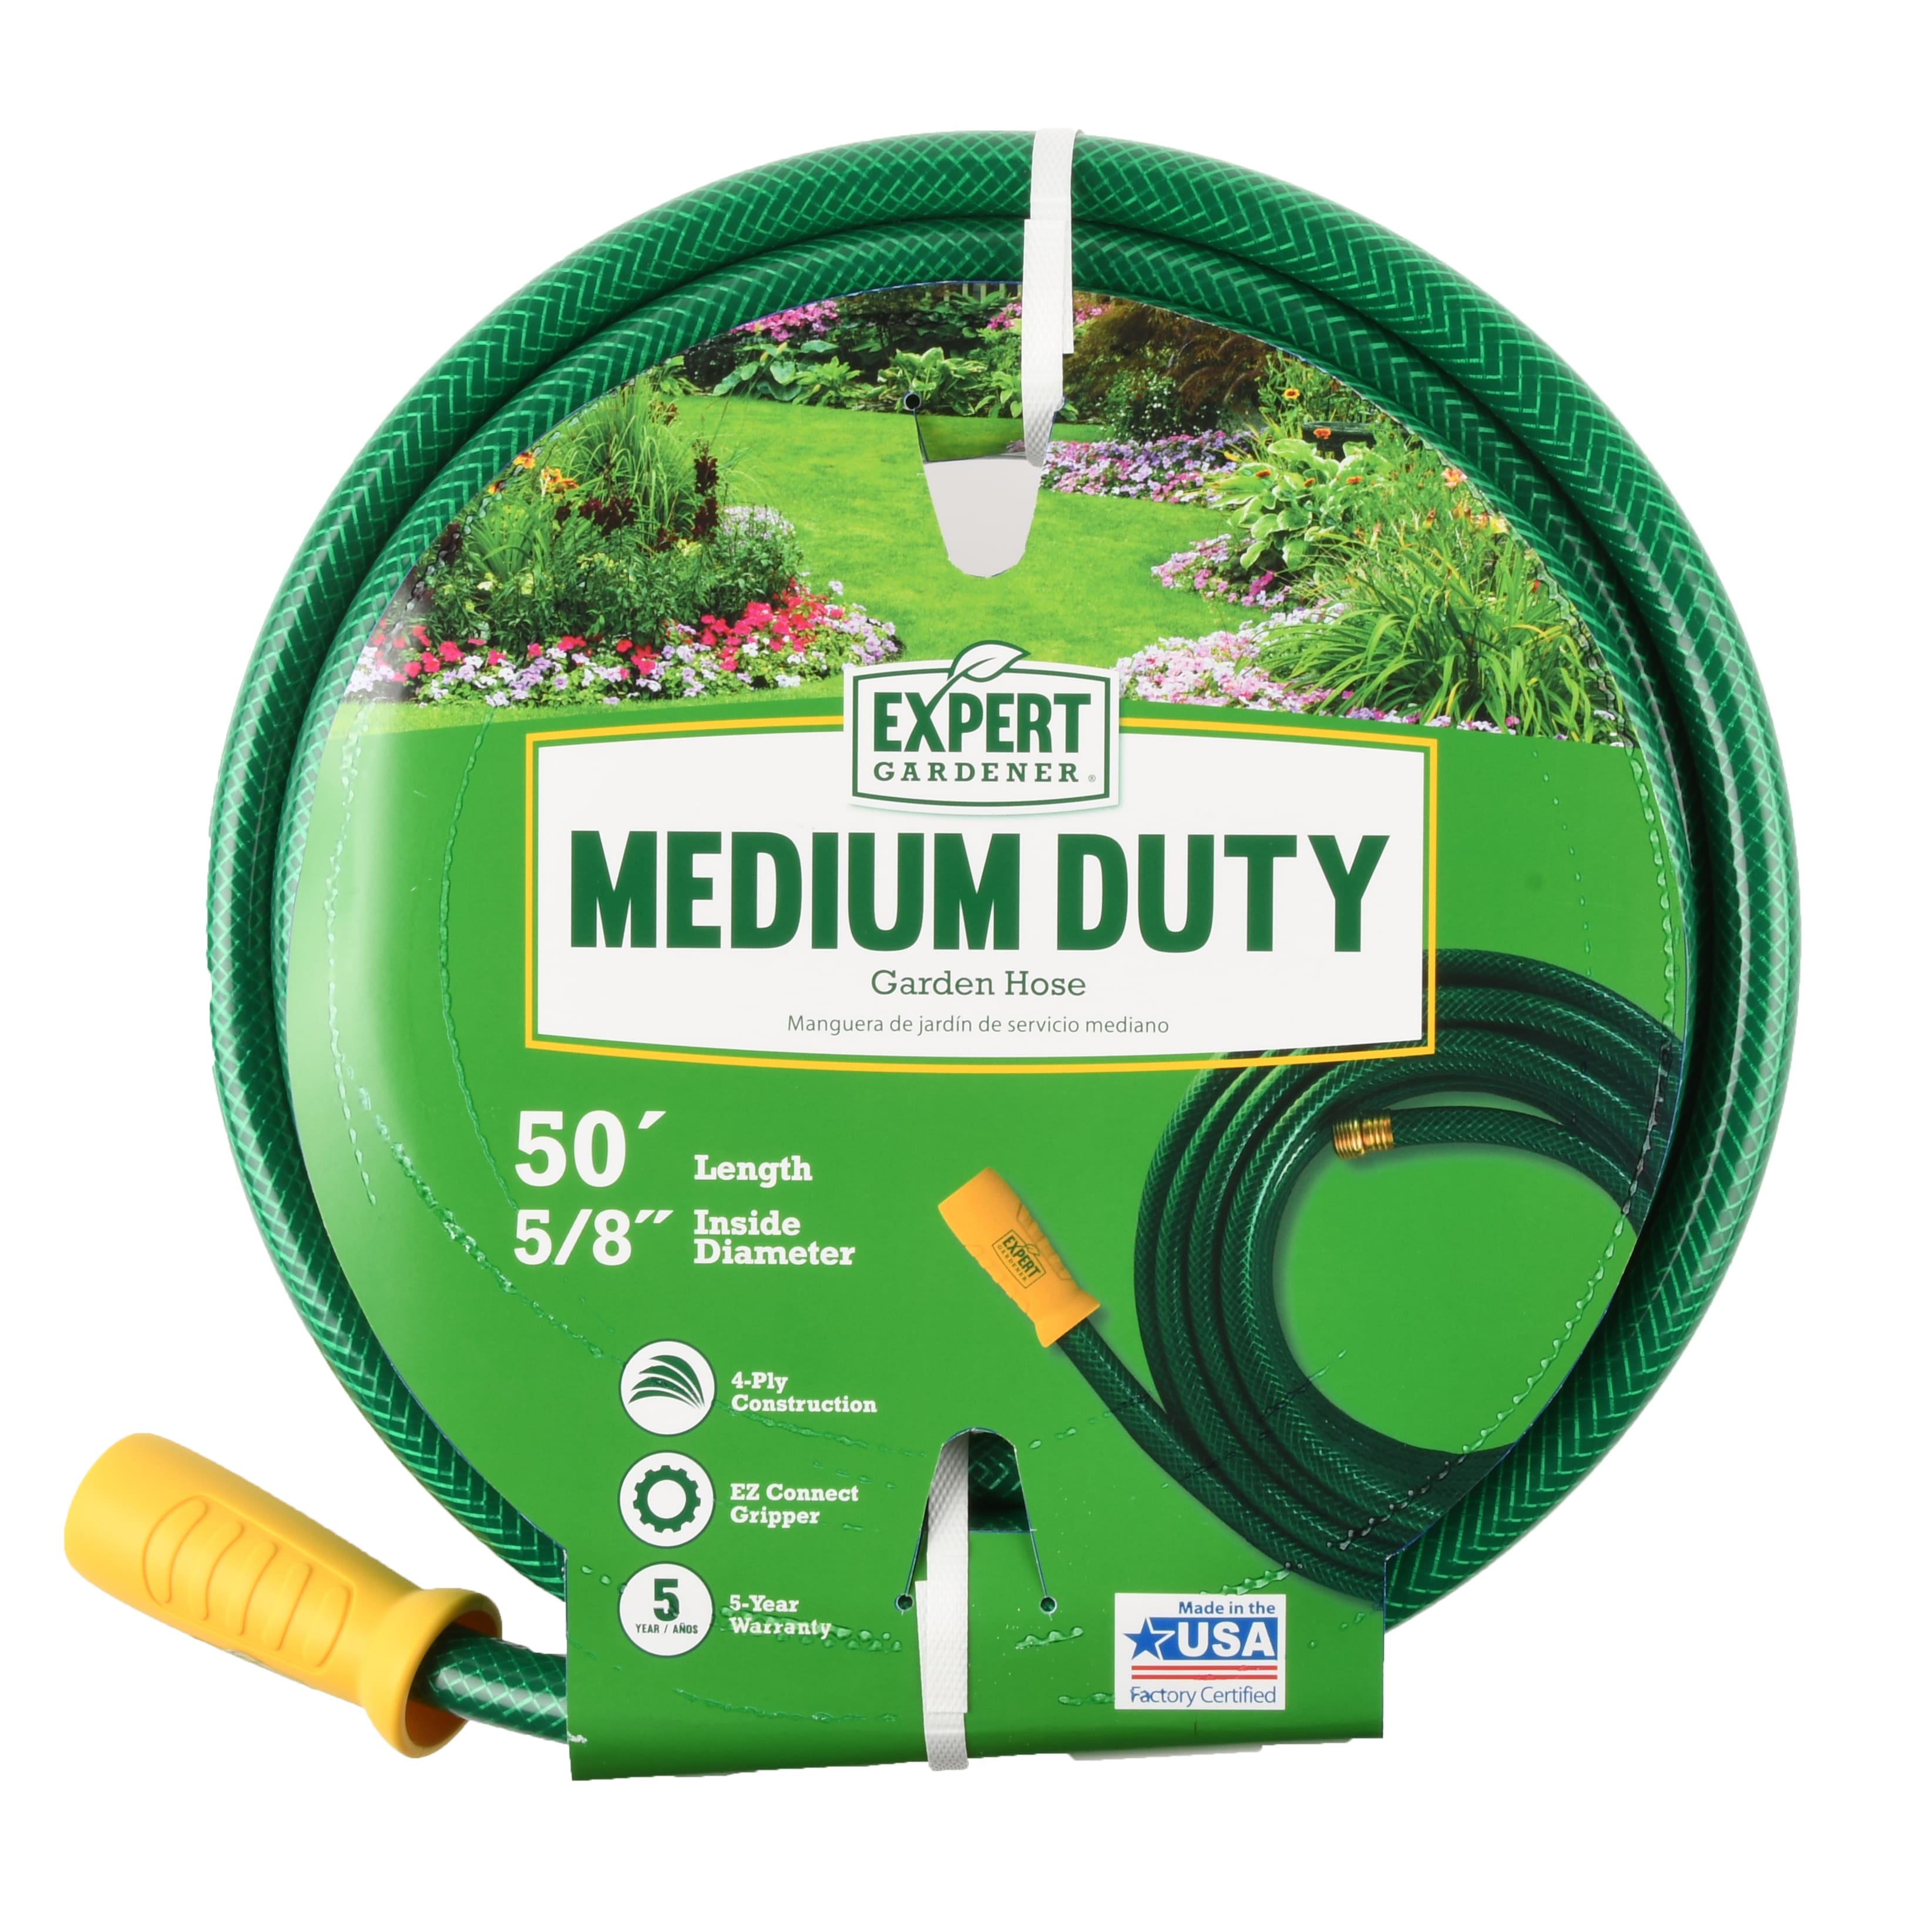 "50' x 5/8"" Expert Gardener Medium Duty Garden Hose $12.48 + Free Store Pickup at Walmart of F/S on $35+"